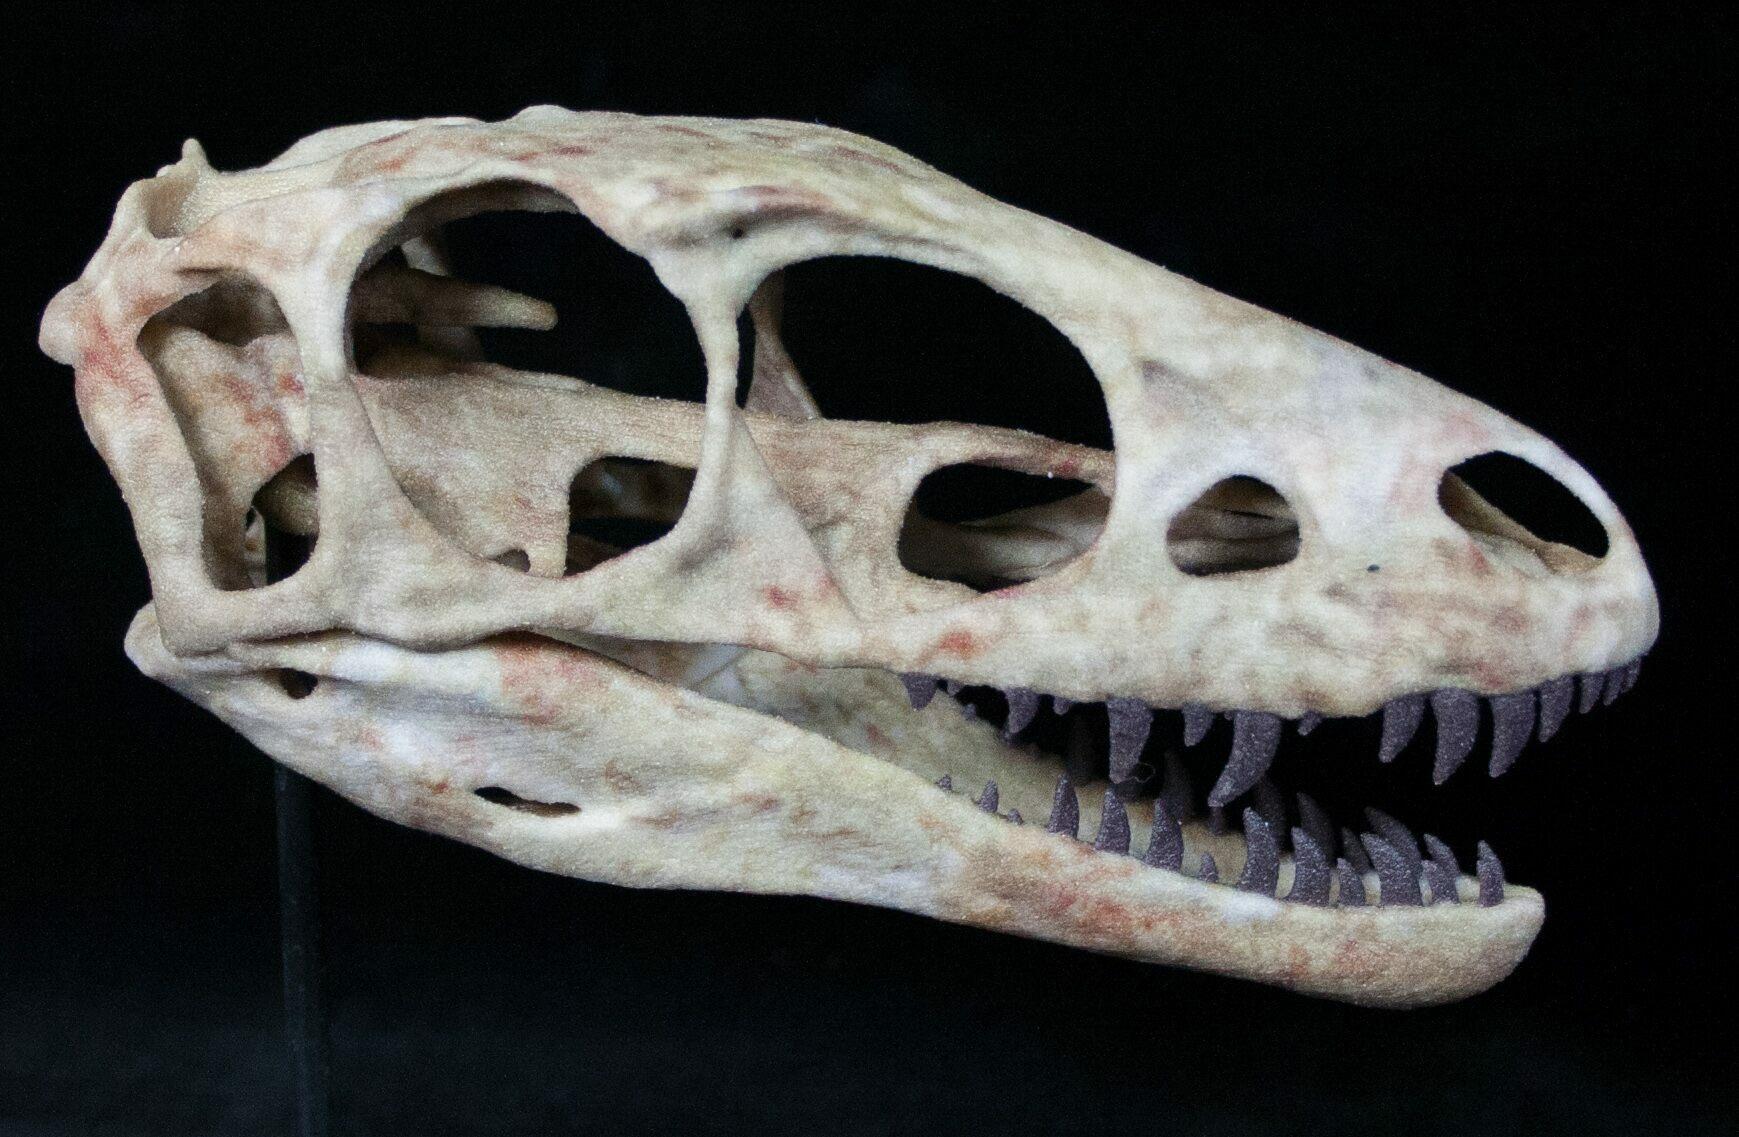 73af4bd5b0e6 Miniature 3D Printed Raptorex (Tyrannosaur) Skull Replica For Sale ...